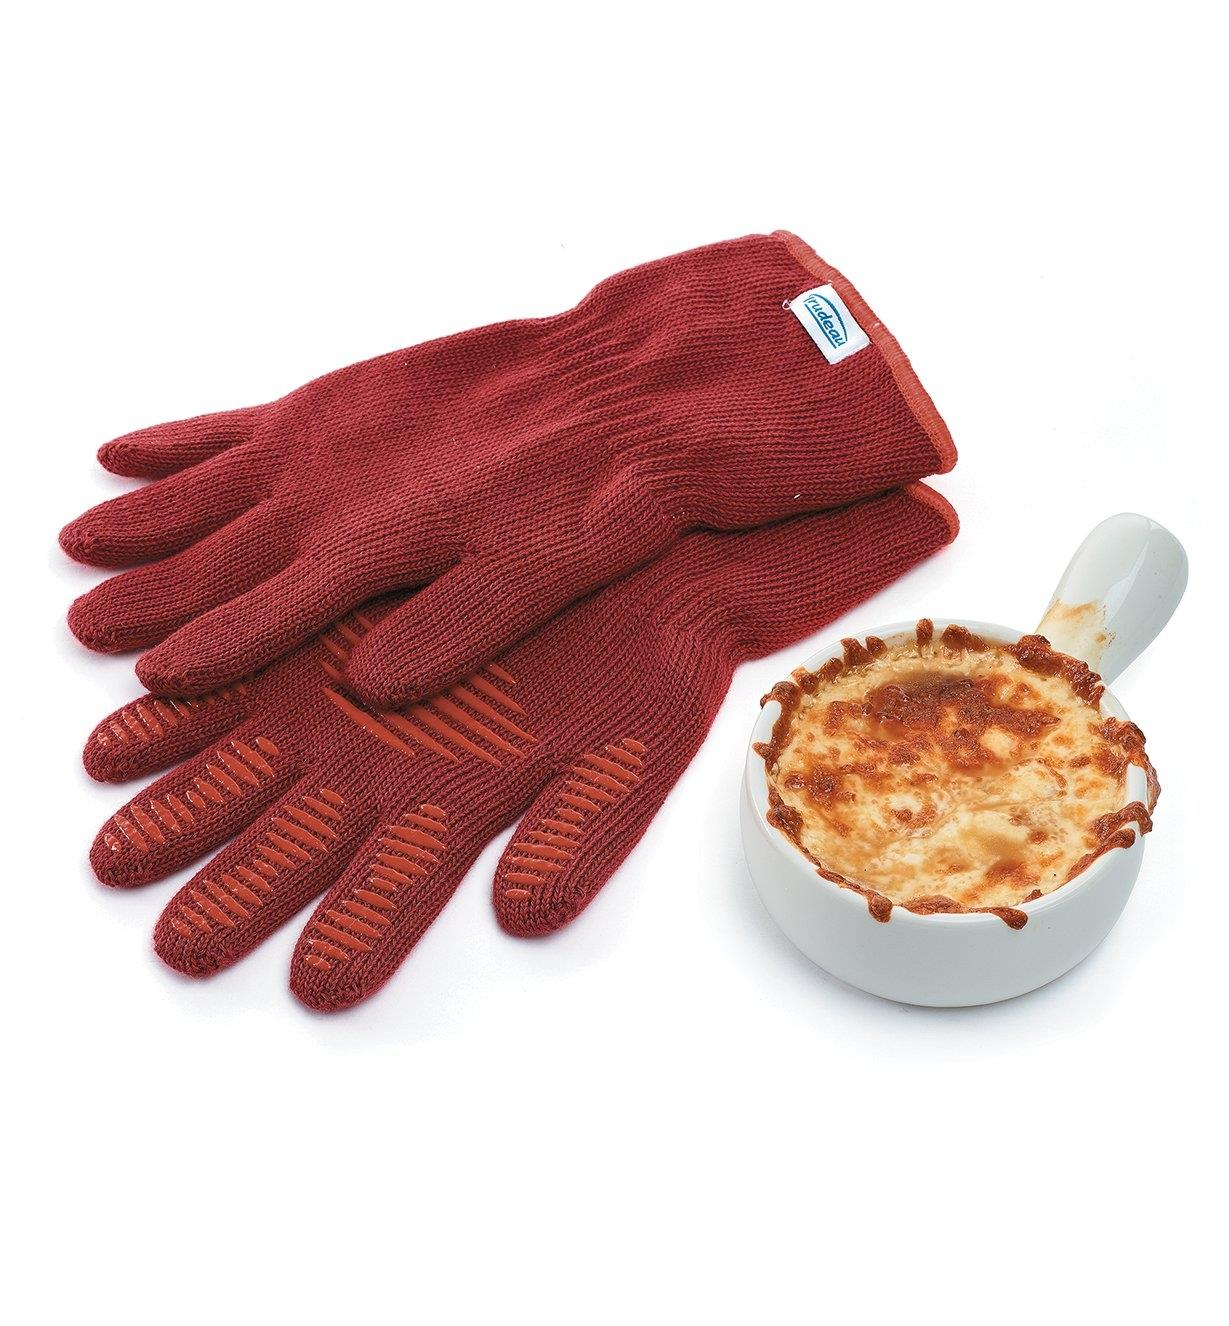 EV273 - Oven Gloves, Medium (size 8 to 9)